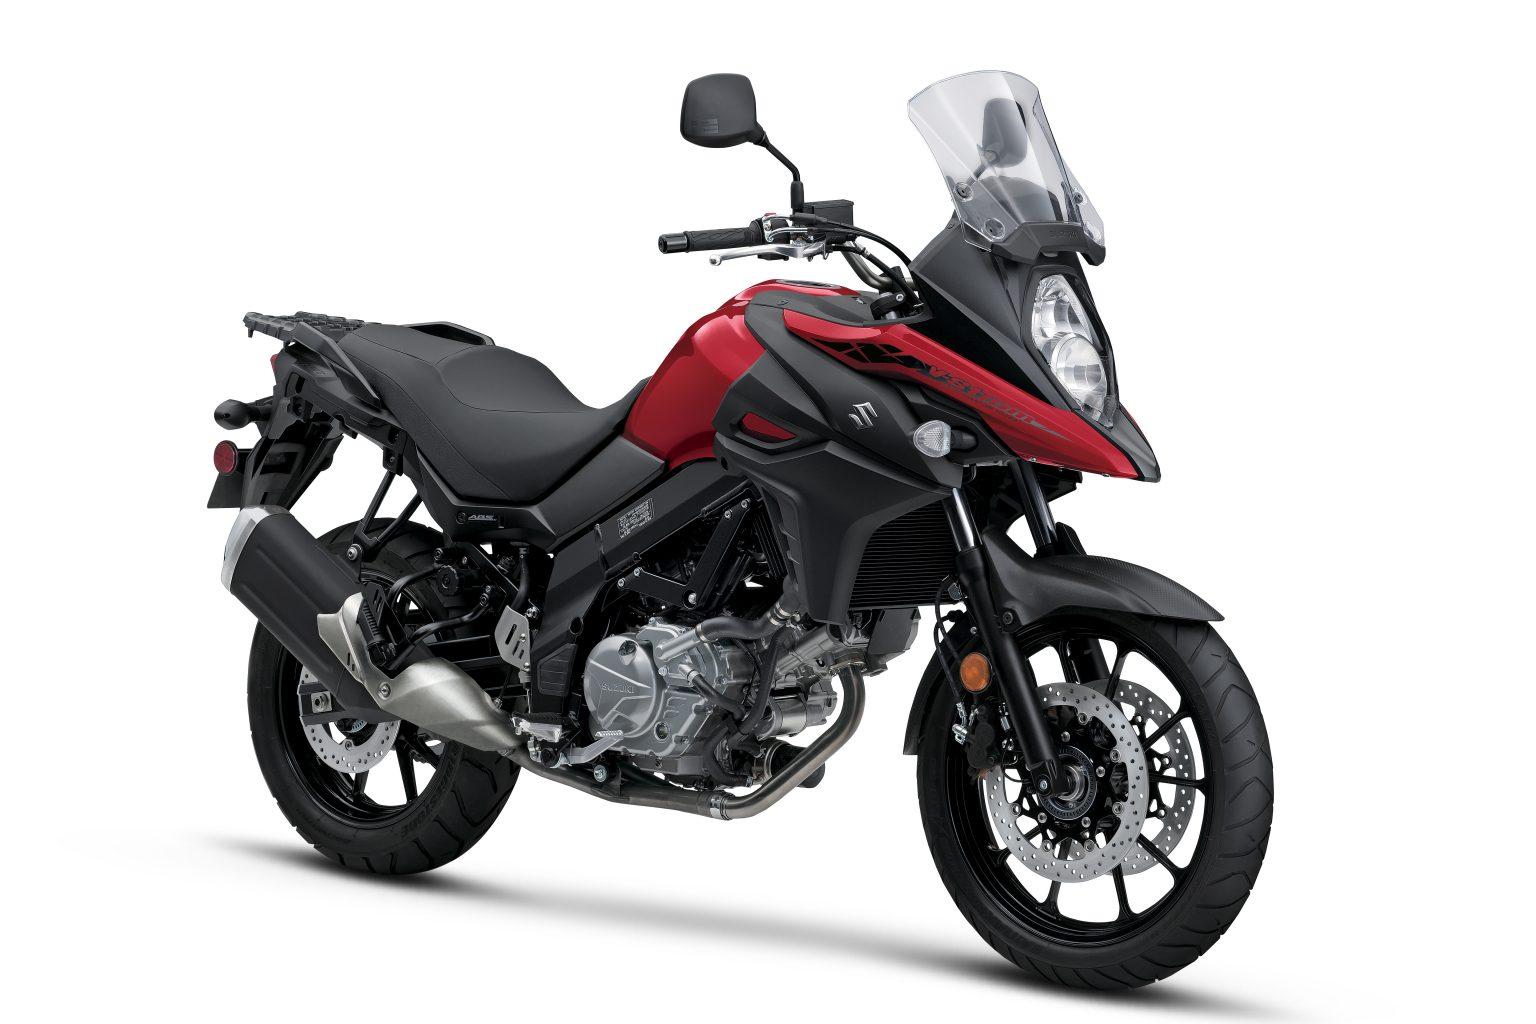 2021 Suzuki model lineup